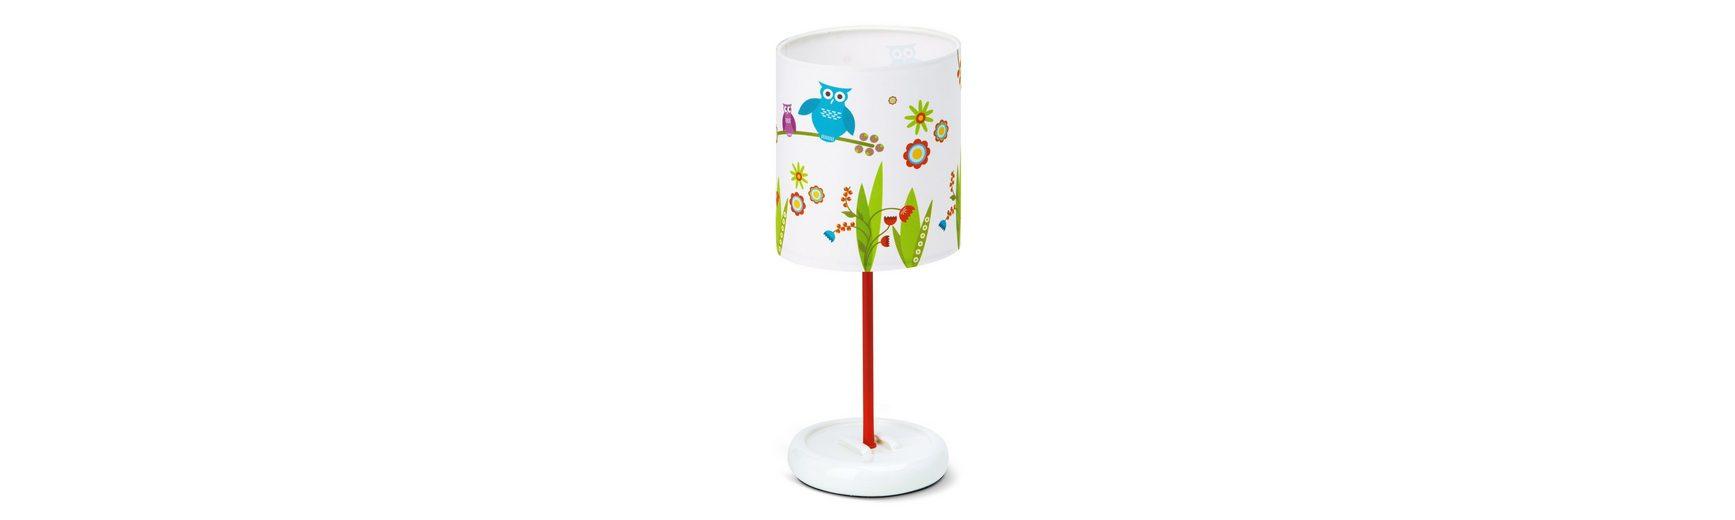 Tischleuchte, inkl. LED Leuchtmittel, Brilliant